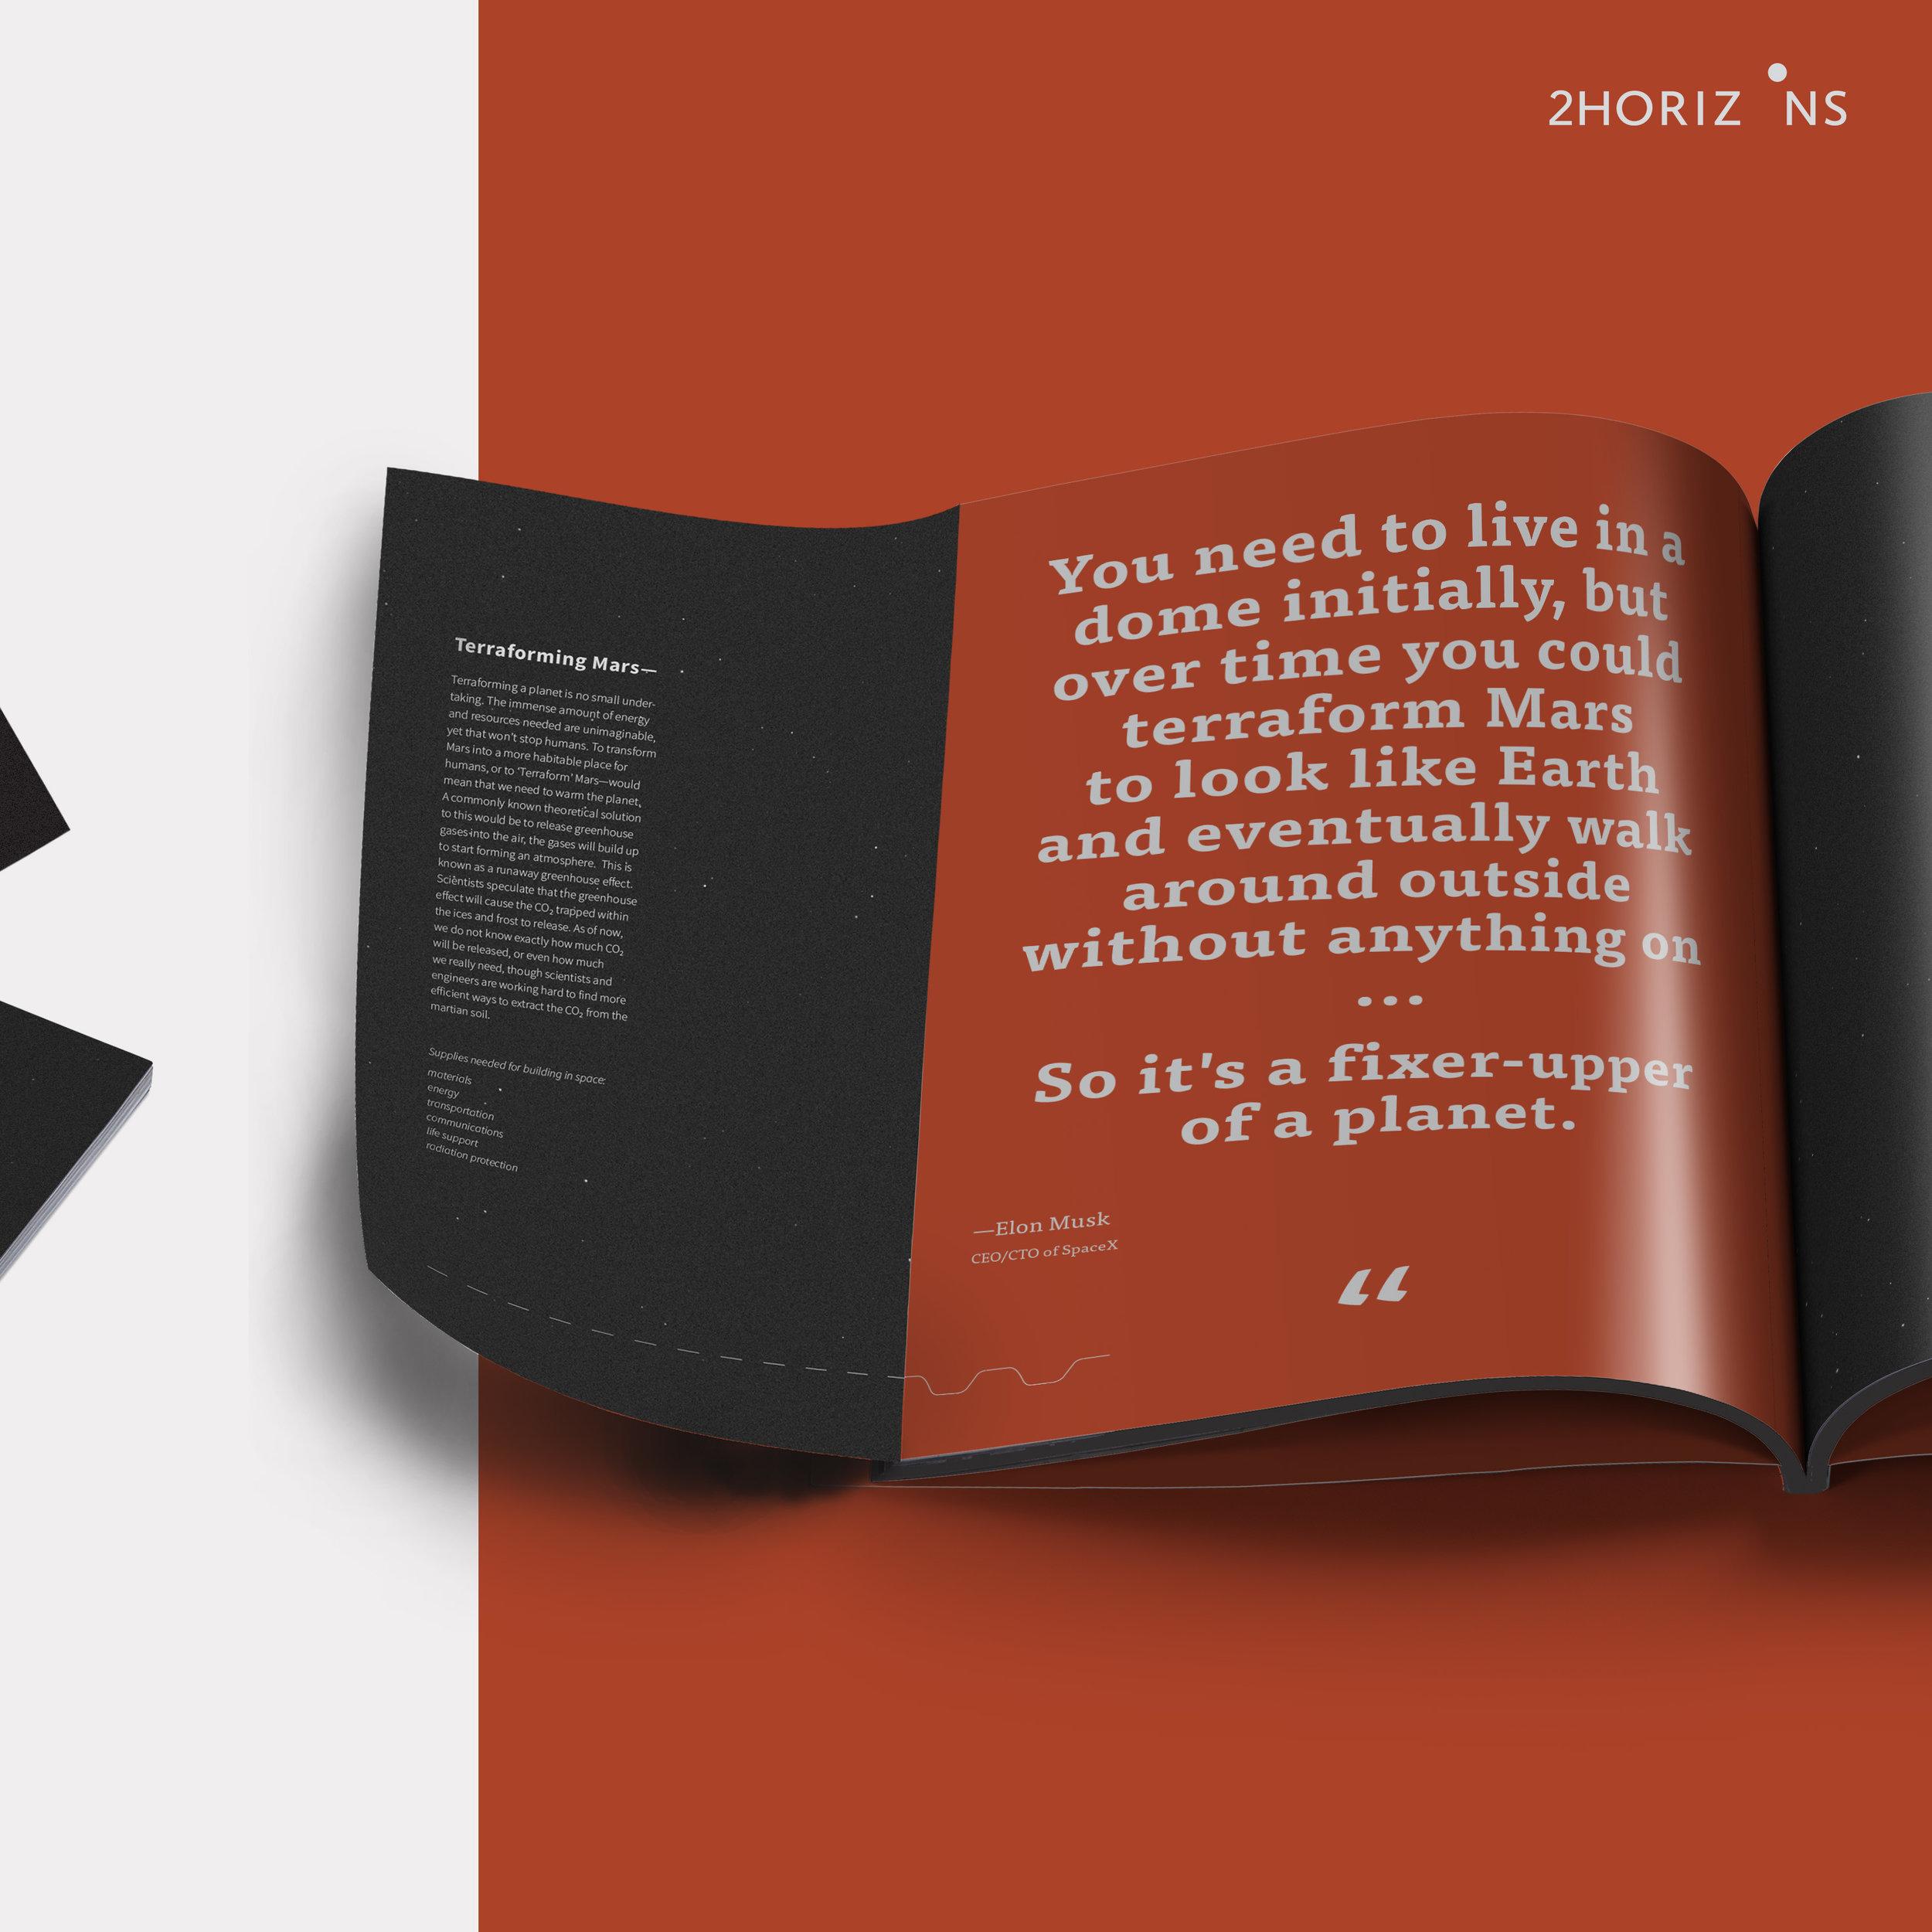 Insta_mahr design2.jpg